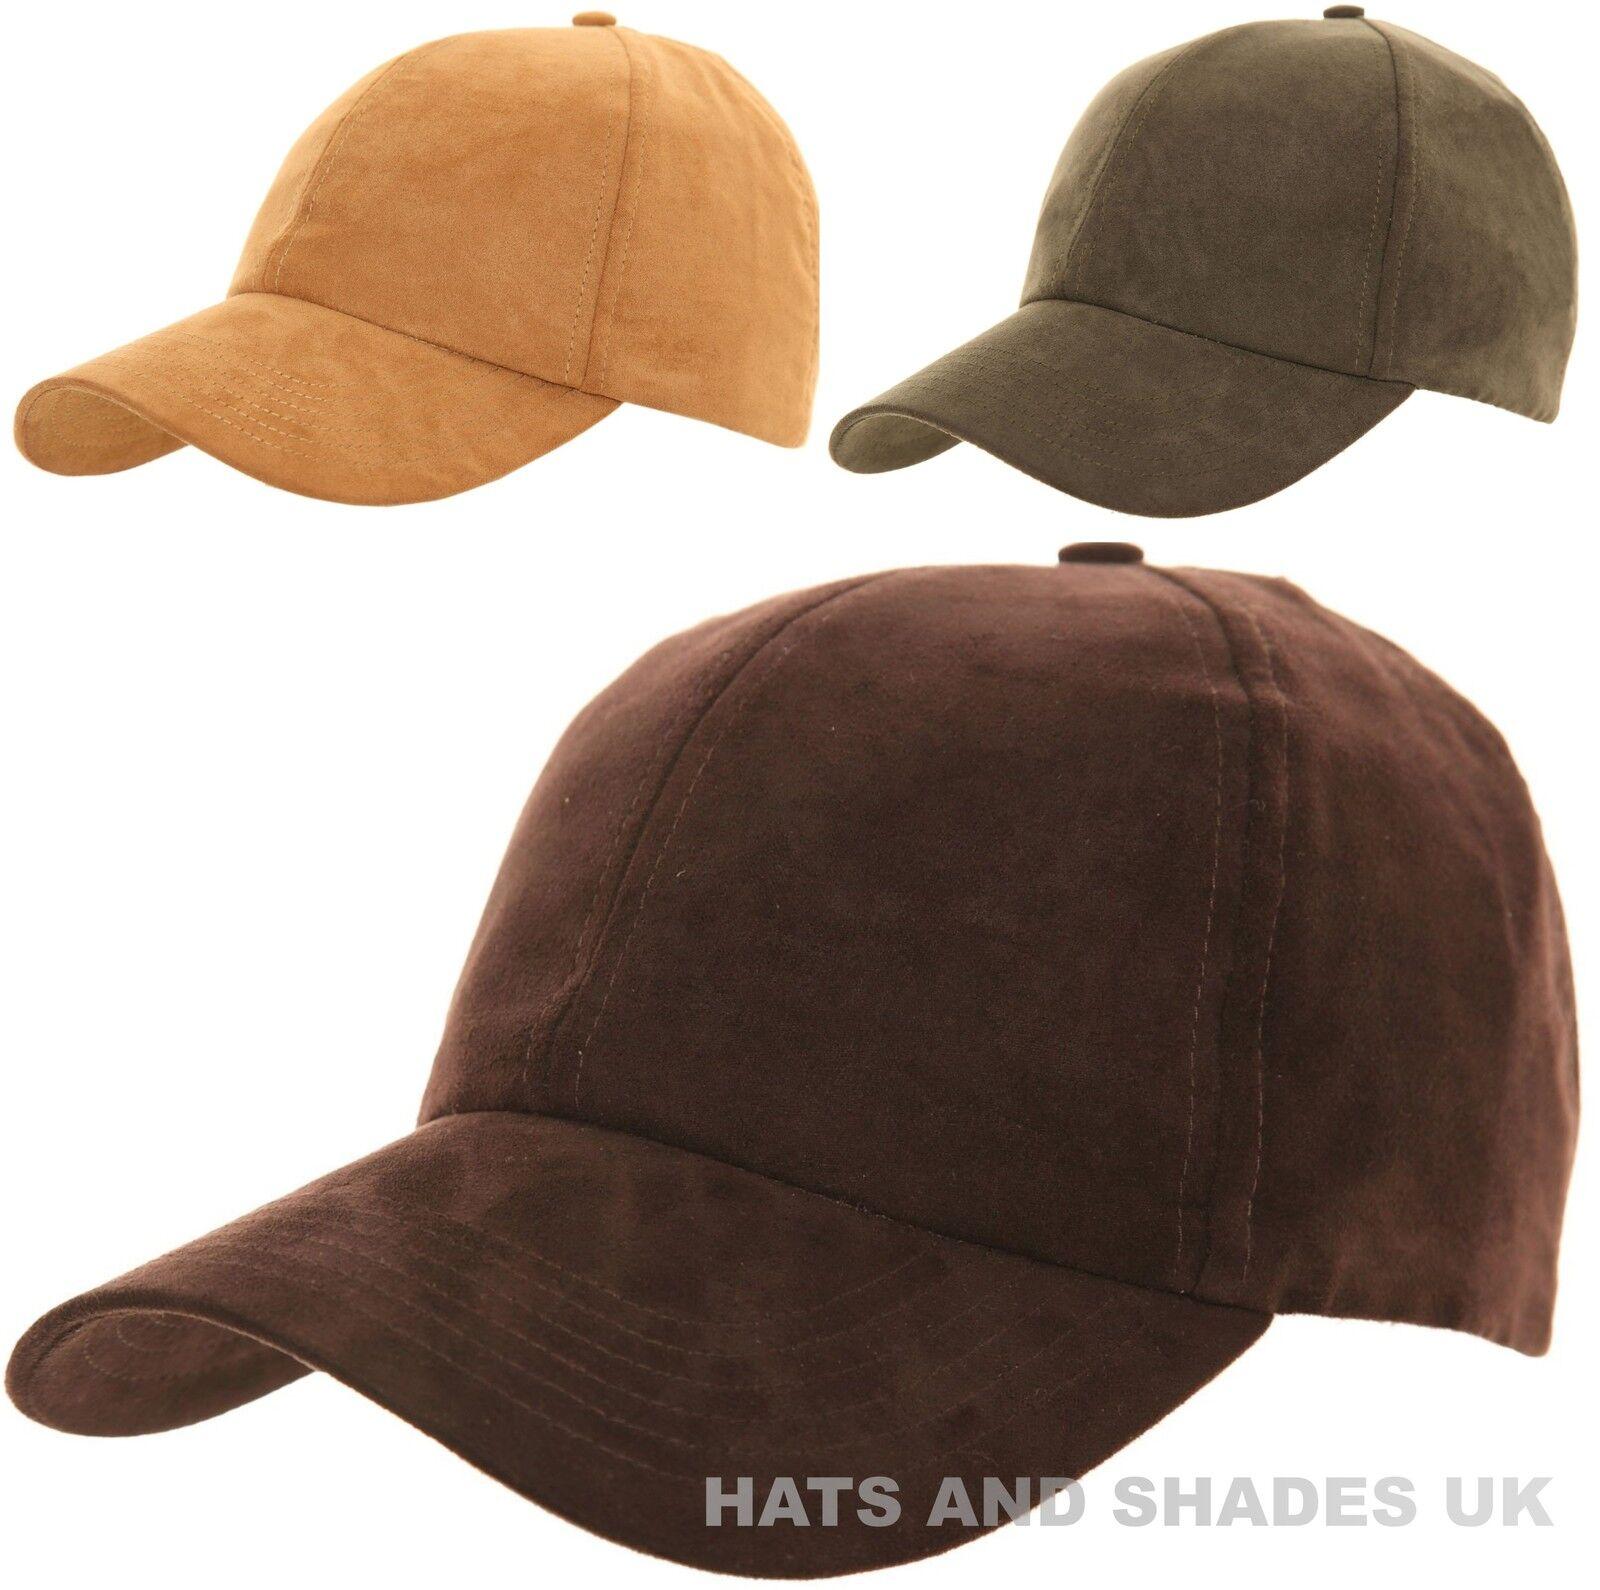 Baseballkappe Kappe Wildleder-Optik Brown Grün Jagd Angeln Country Herren Damen